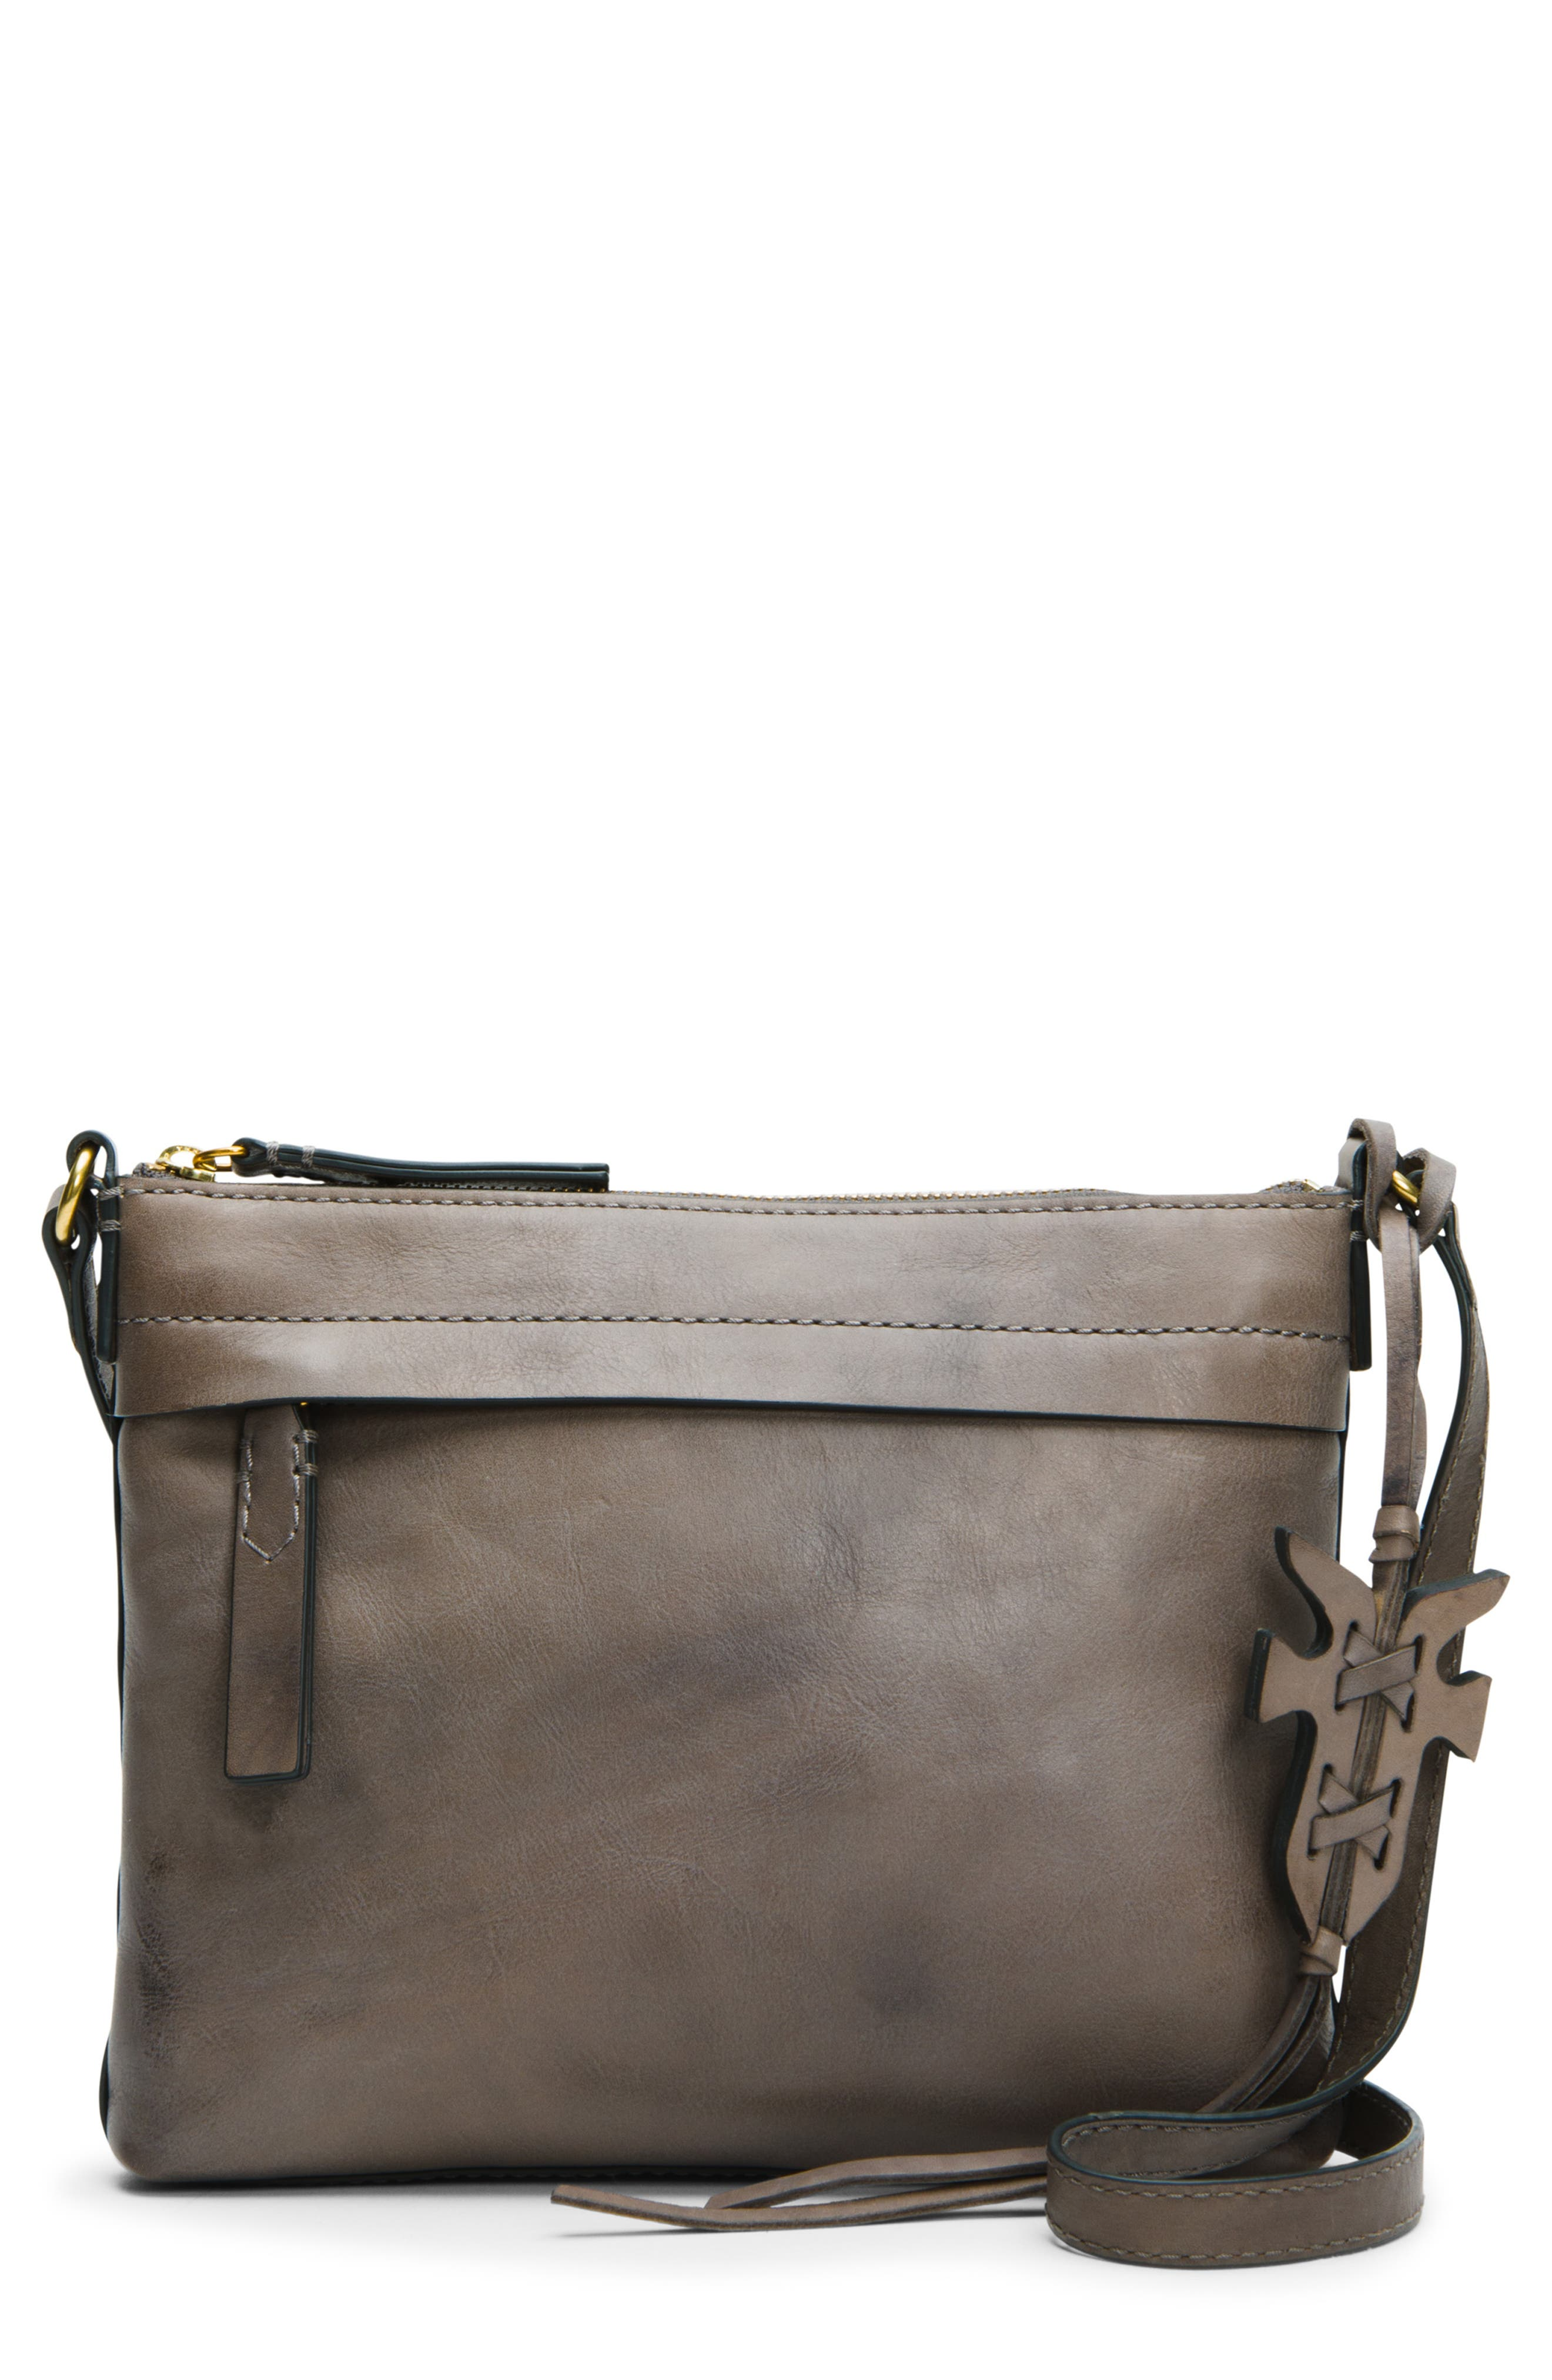 Carson Leather Crossbody Bag,                             Main thumbnail 1, color,                             030